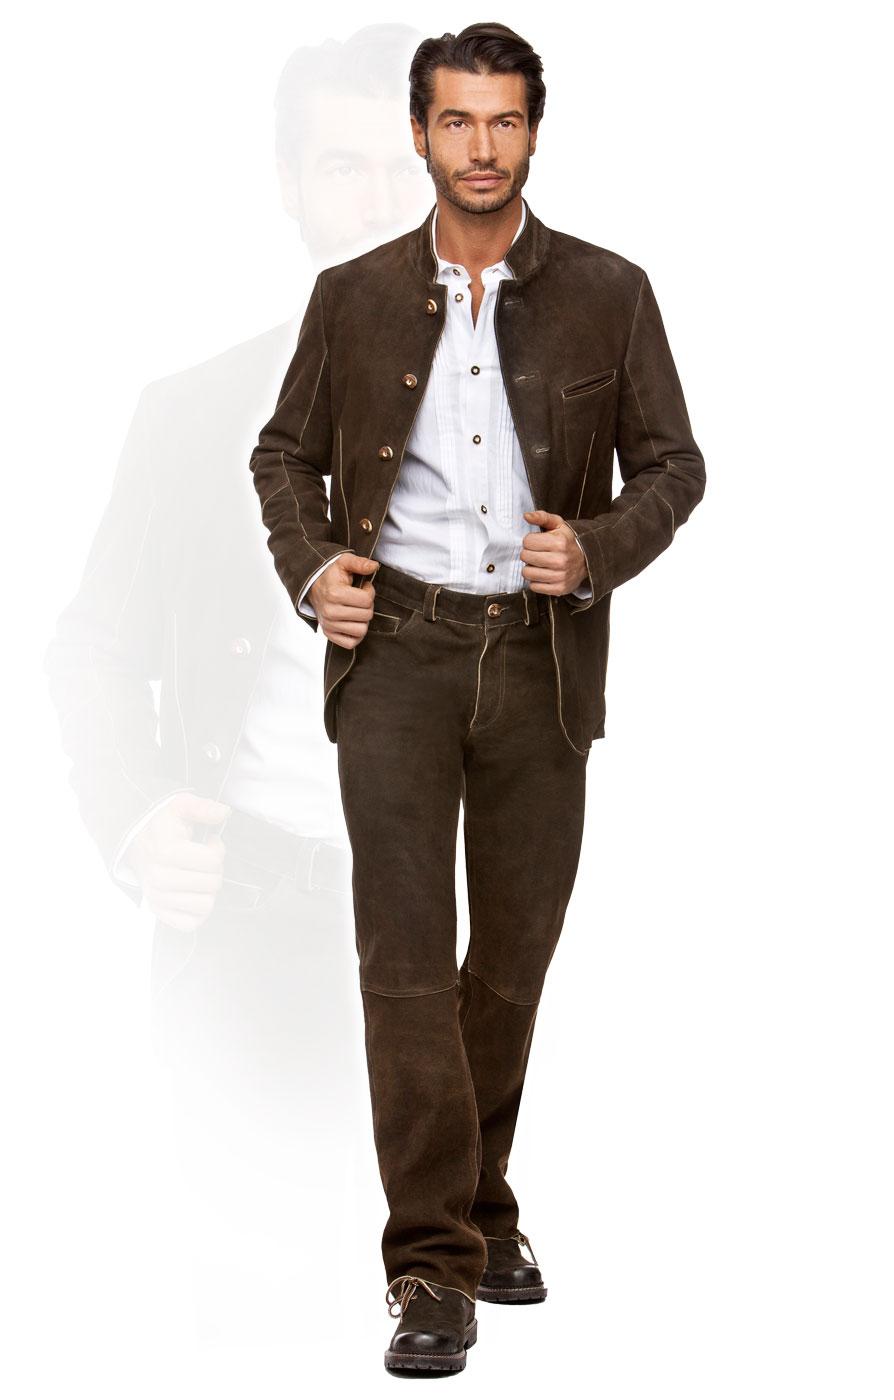 Bavarian winter clothing: jackets and overcoats | Oktoberfest Dirndl Blog